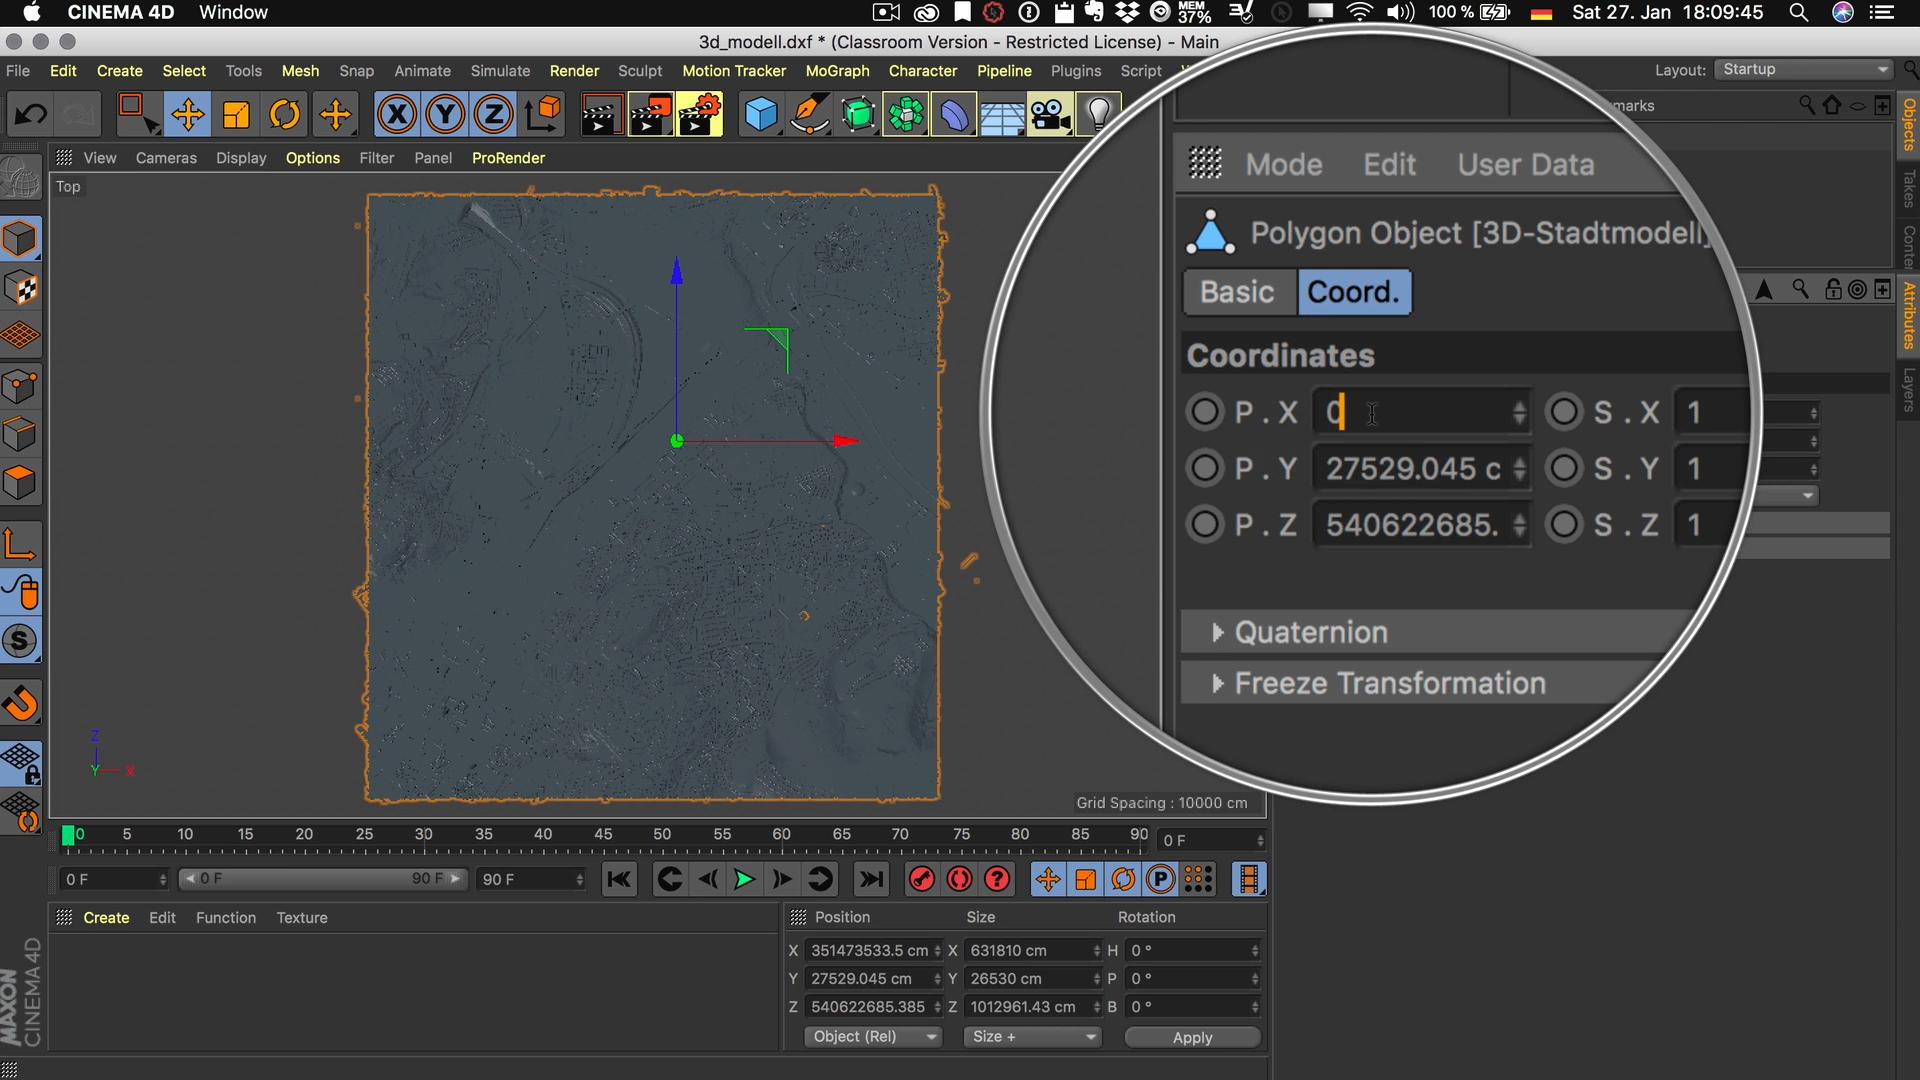 Cinema4D 3D-Stadtmodell Position Modell Koordinaten P.X 0